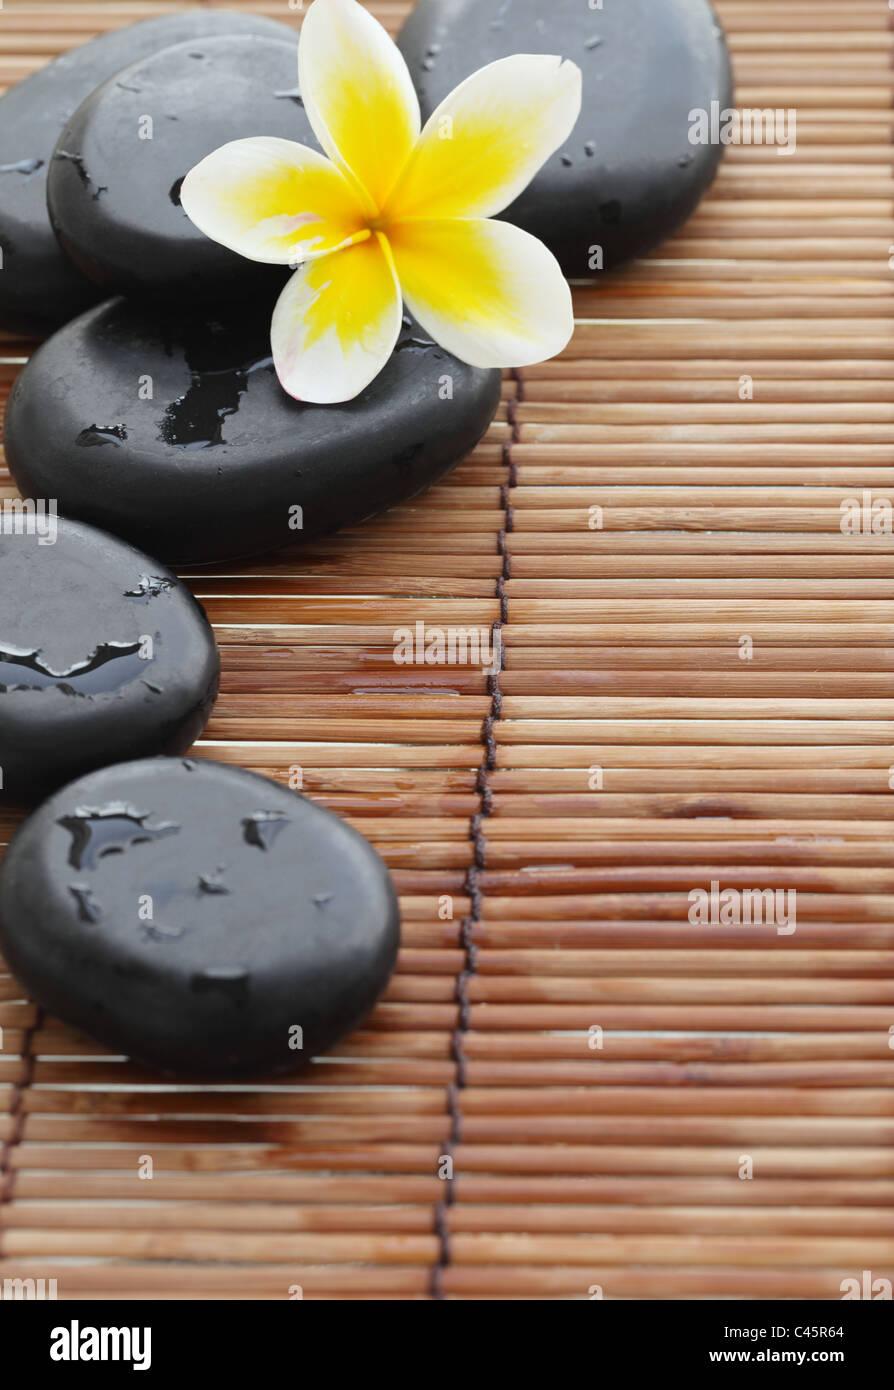 Spa still life with zen stone and frangipani flower,Closeup. - Stock Image